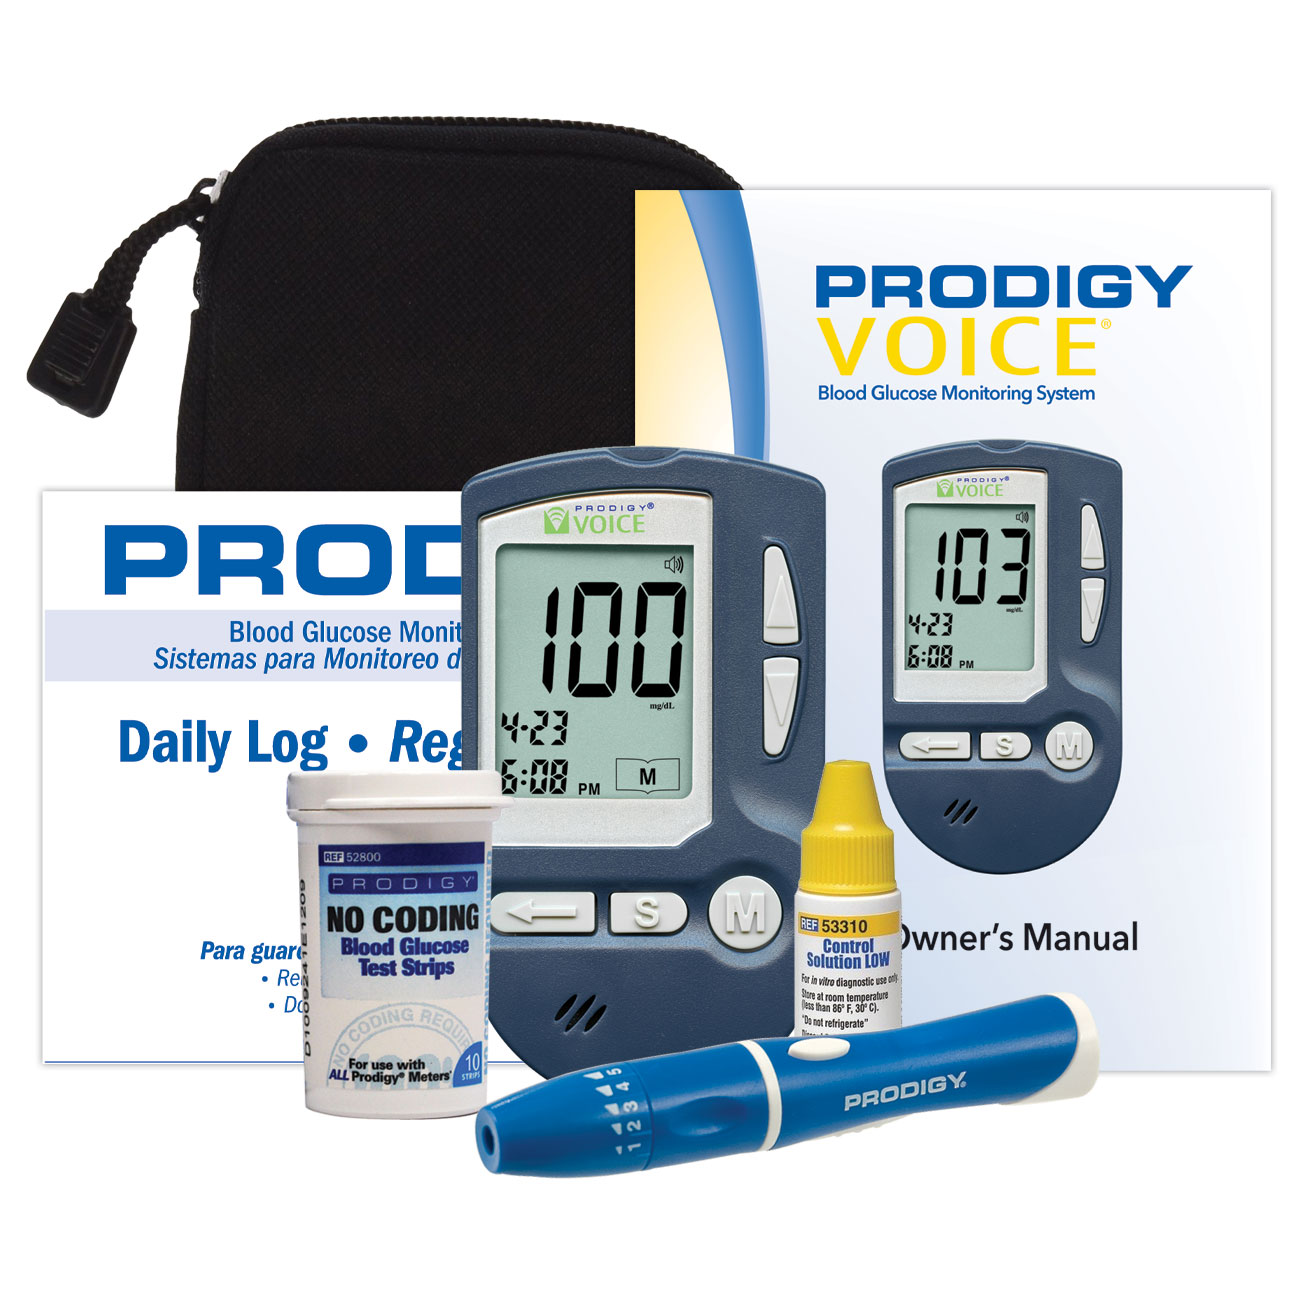 Voice Talking Blood Glucose Monitor Kit